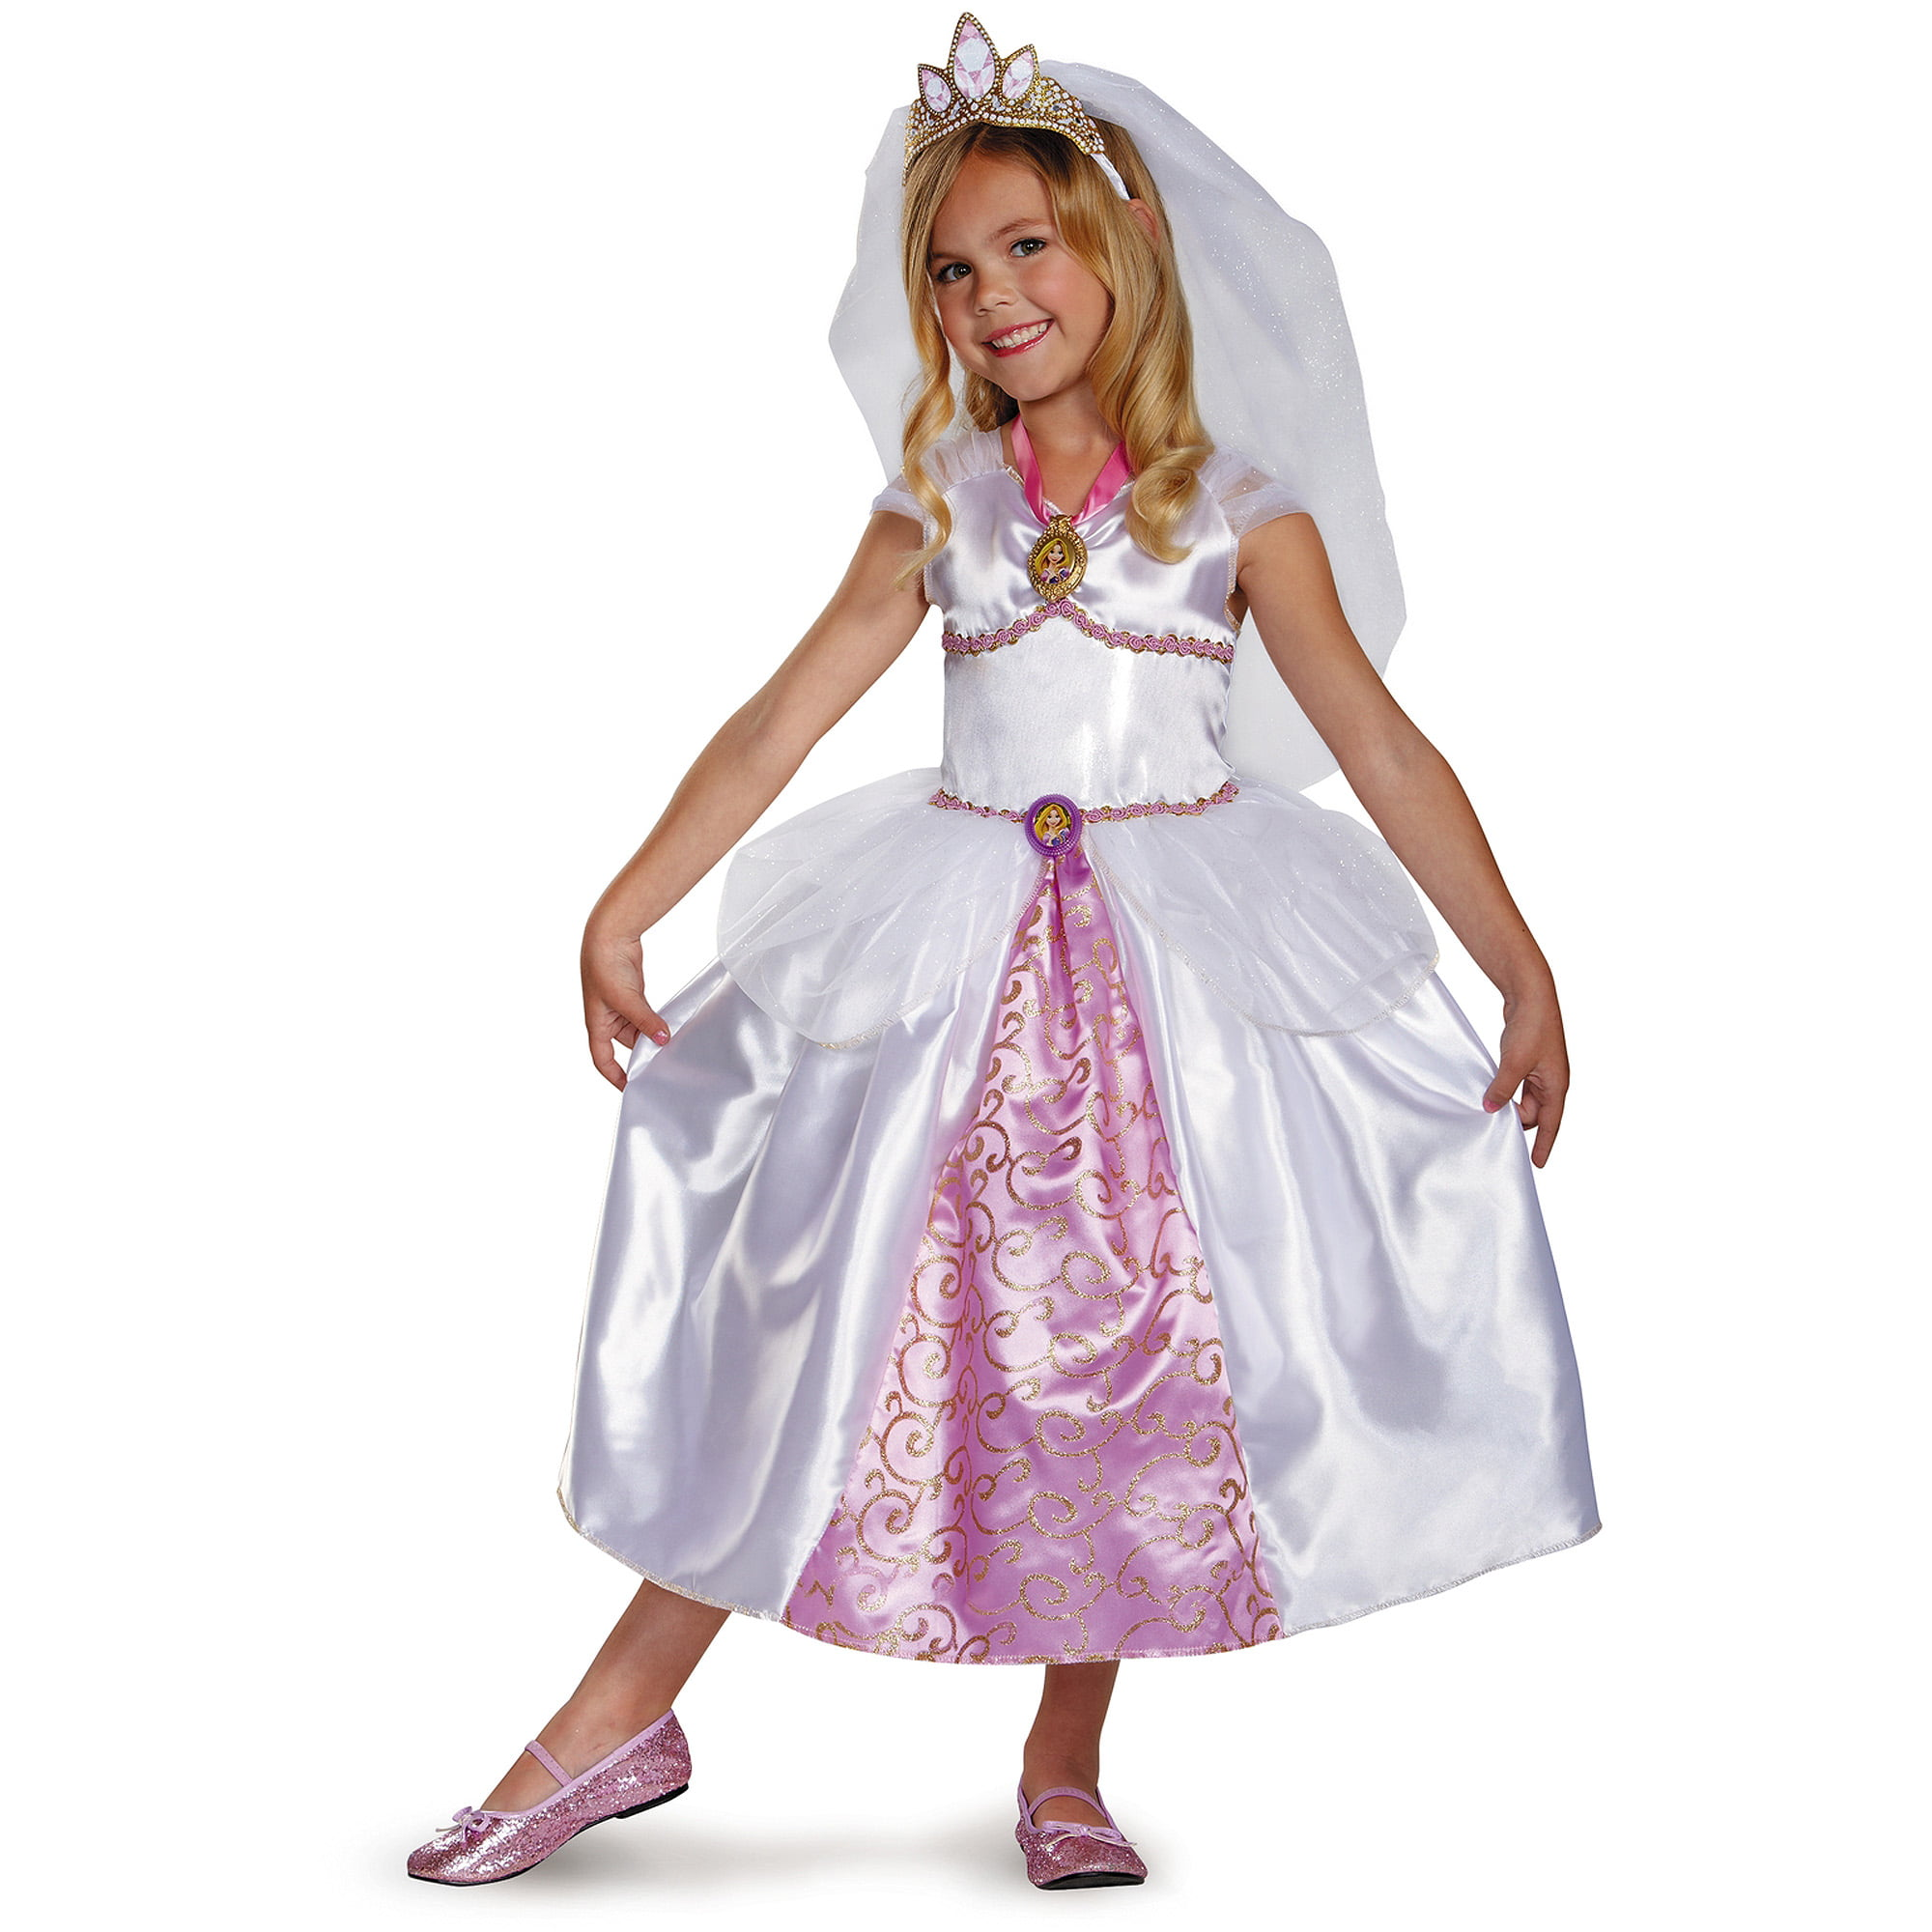 rapunzel wedding gown child halloween costume - walmart